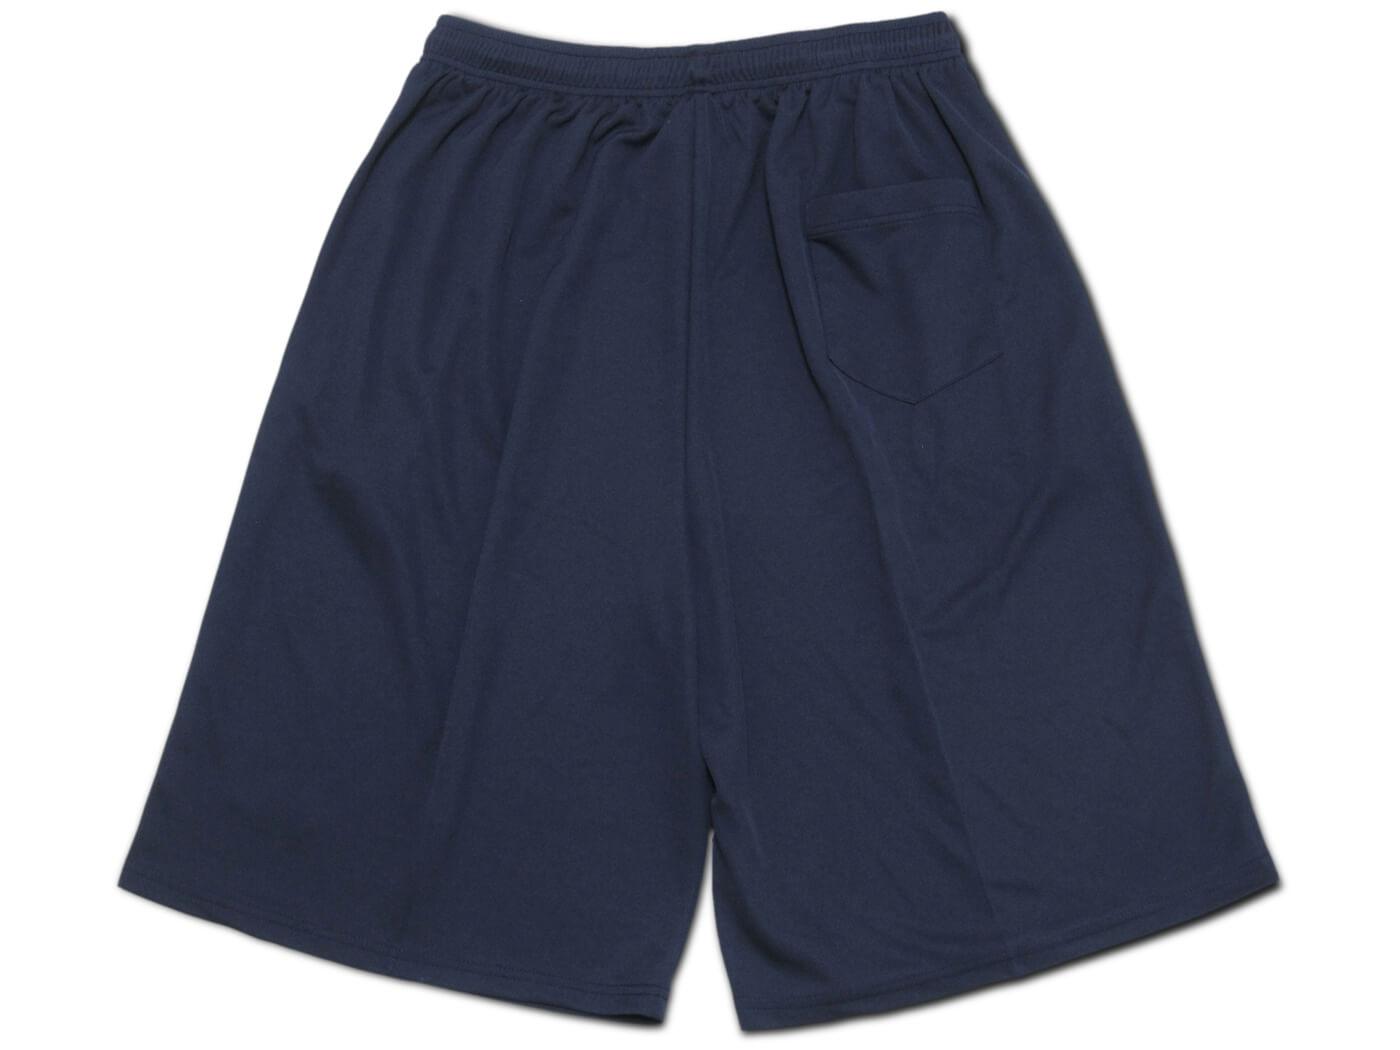 sun-e加大尺碼吸濕排汗運動褲、大尺碼台灣製造運動短褲、全腰圍鬆緊帶有口袋藍球褲、排汗速乾短褲、運動休閒短褲、休閒五分褲、BIG&TALL、SPORTS SHORTS、黑色短褲(310-8036-08)深藍色(310-8036-21)黑色(310-8036-22)深灰 4L 5L (腰圍:38~58英吋) [實體店面保障] 2